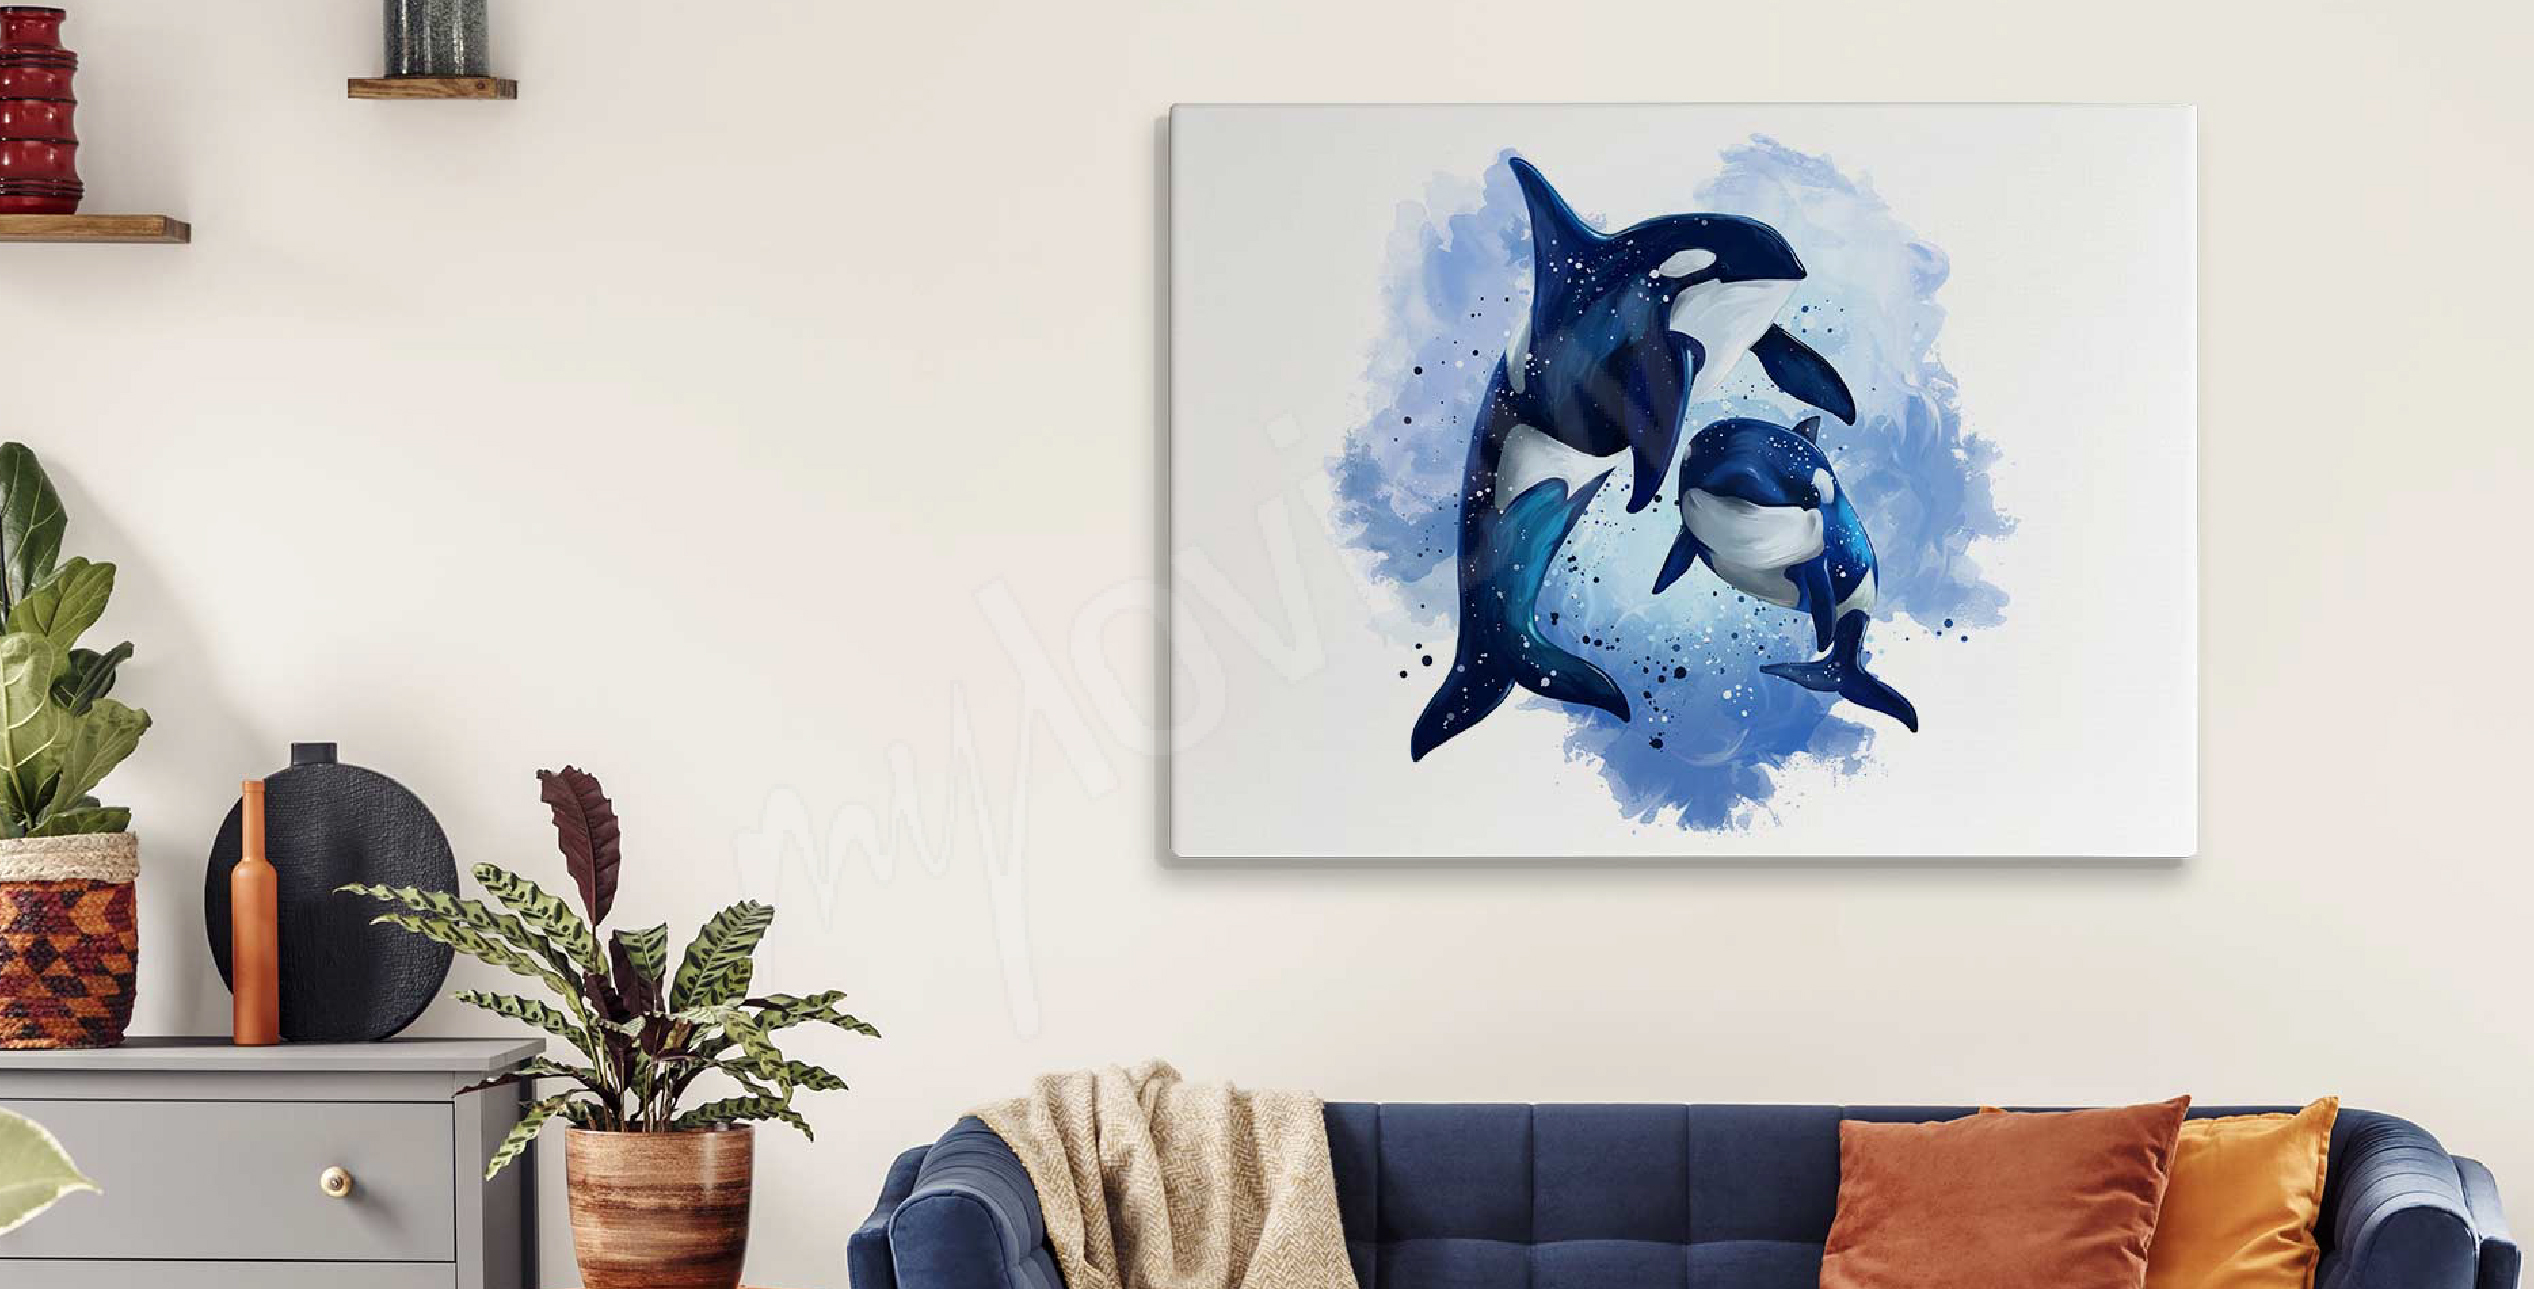 Obraz akwarela i delfiny